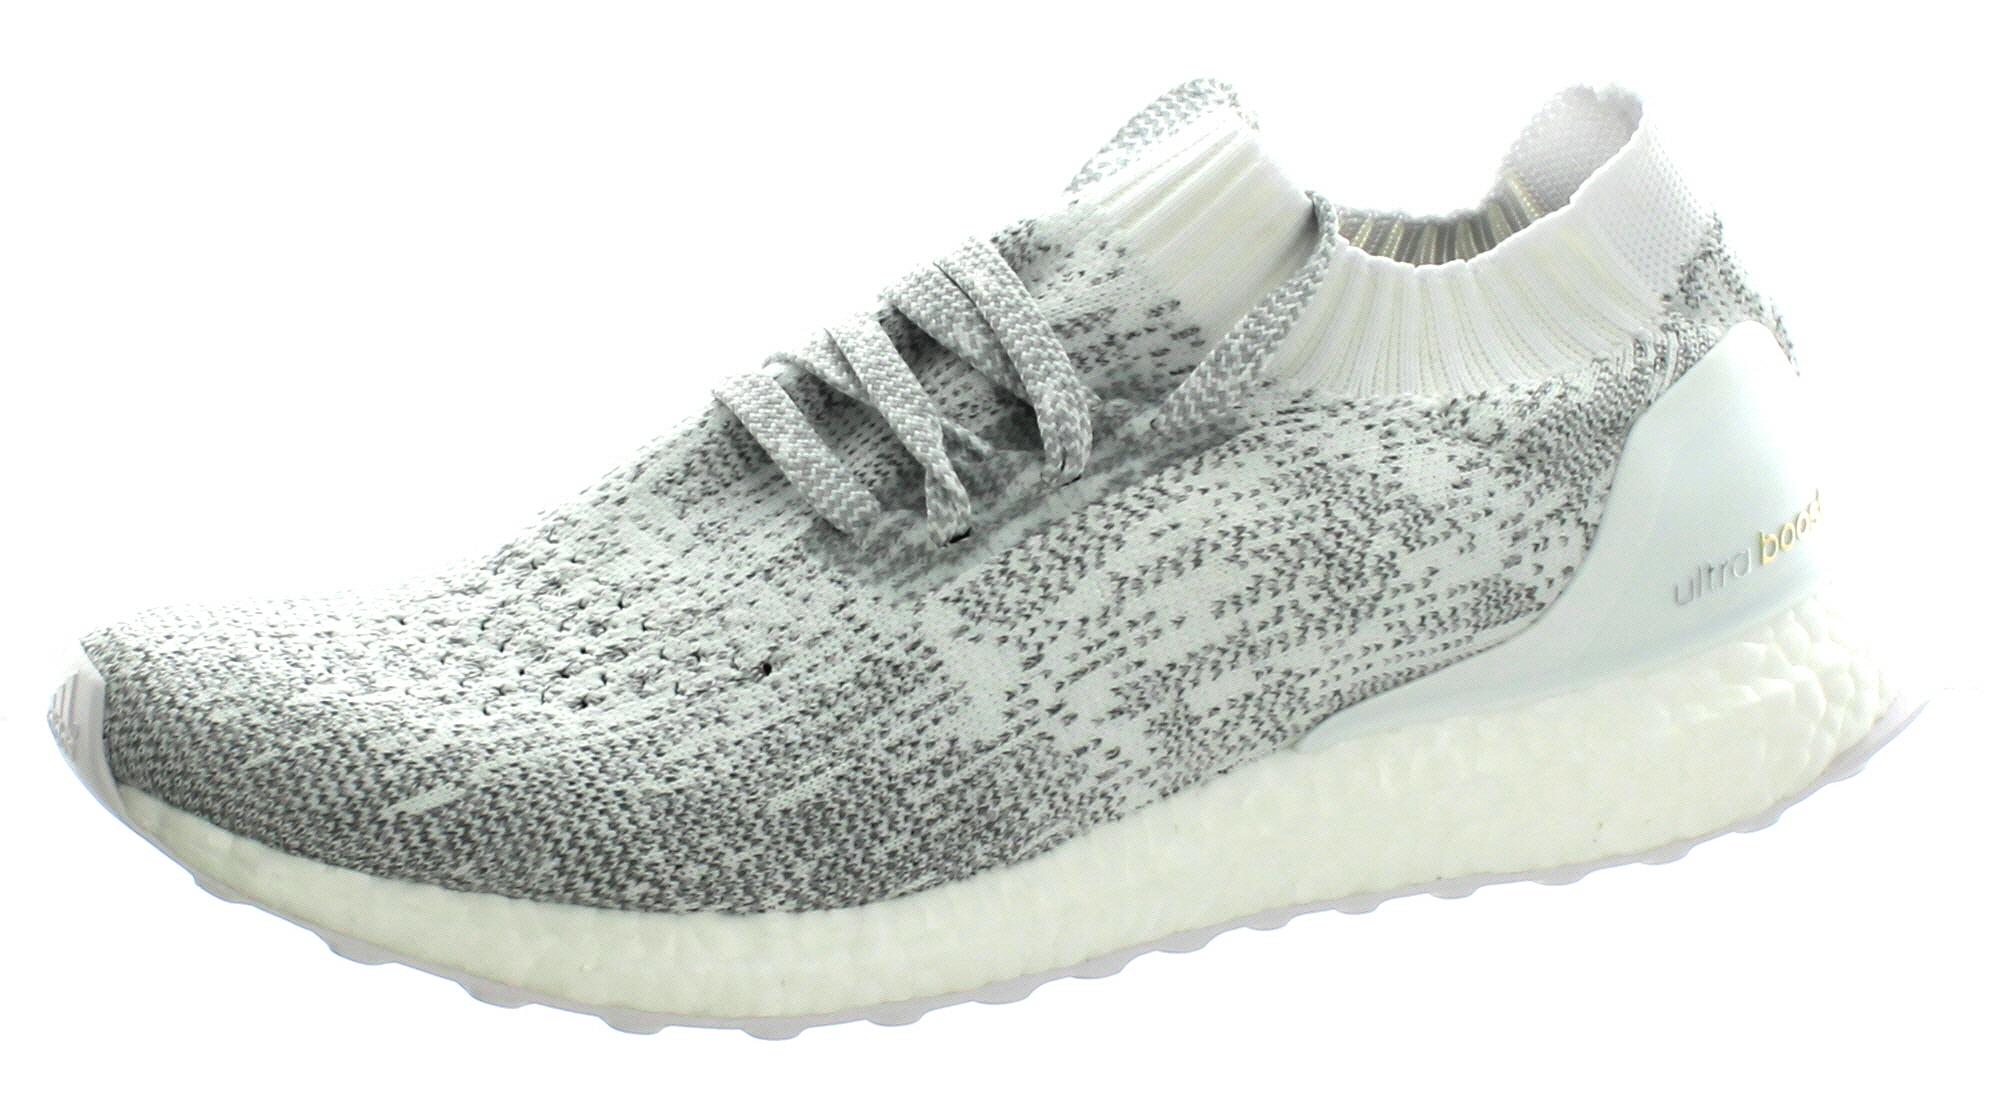 buy popular 184ca c2f4f adidas ultra boost white reflective equipment